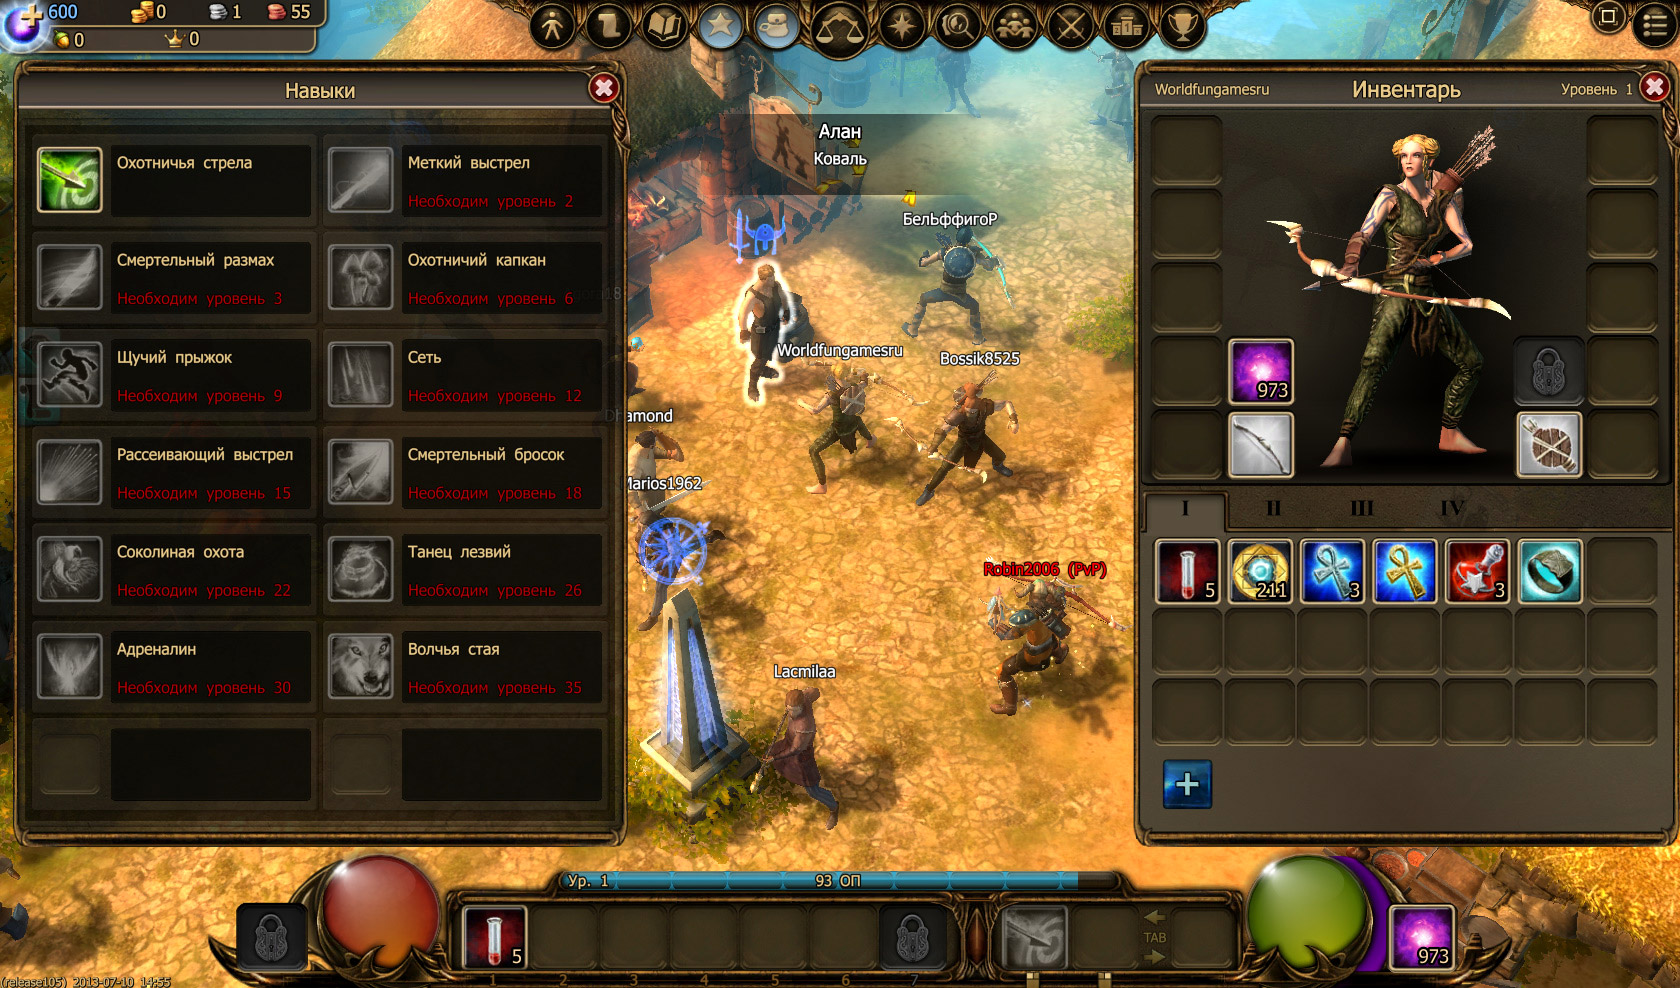 WorldfunGames_Drakensang Online 6